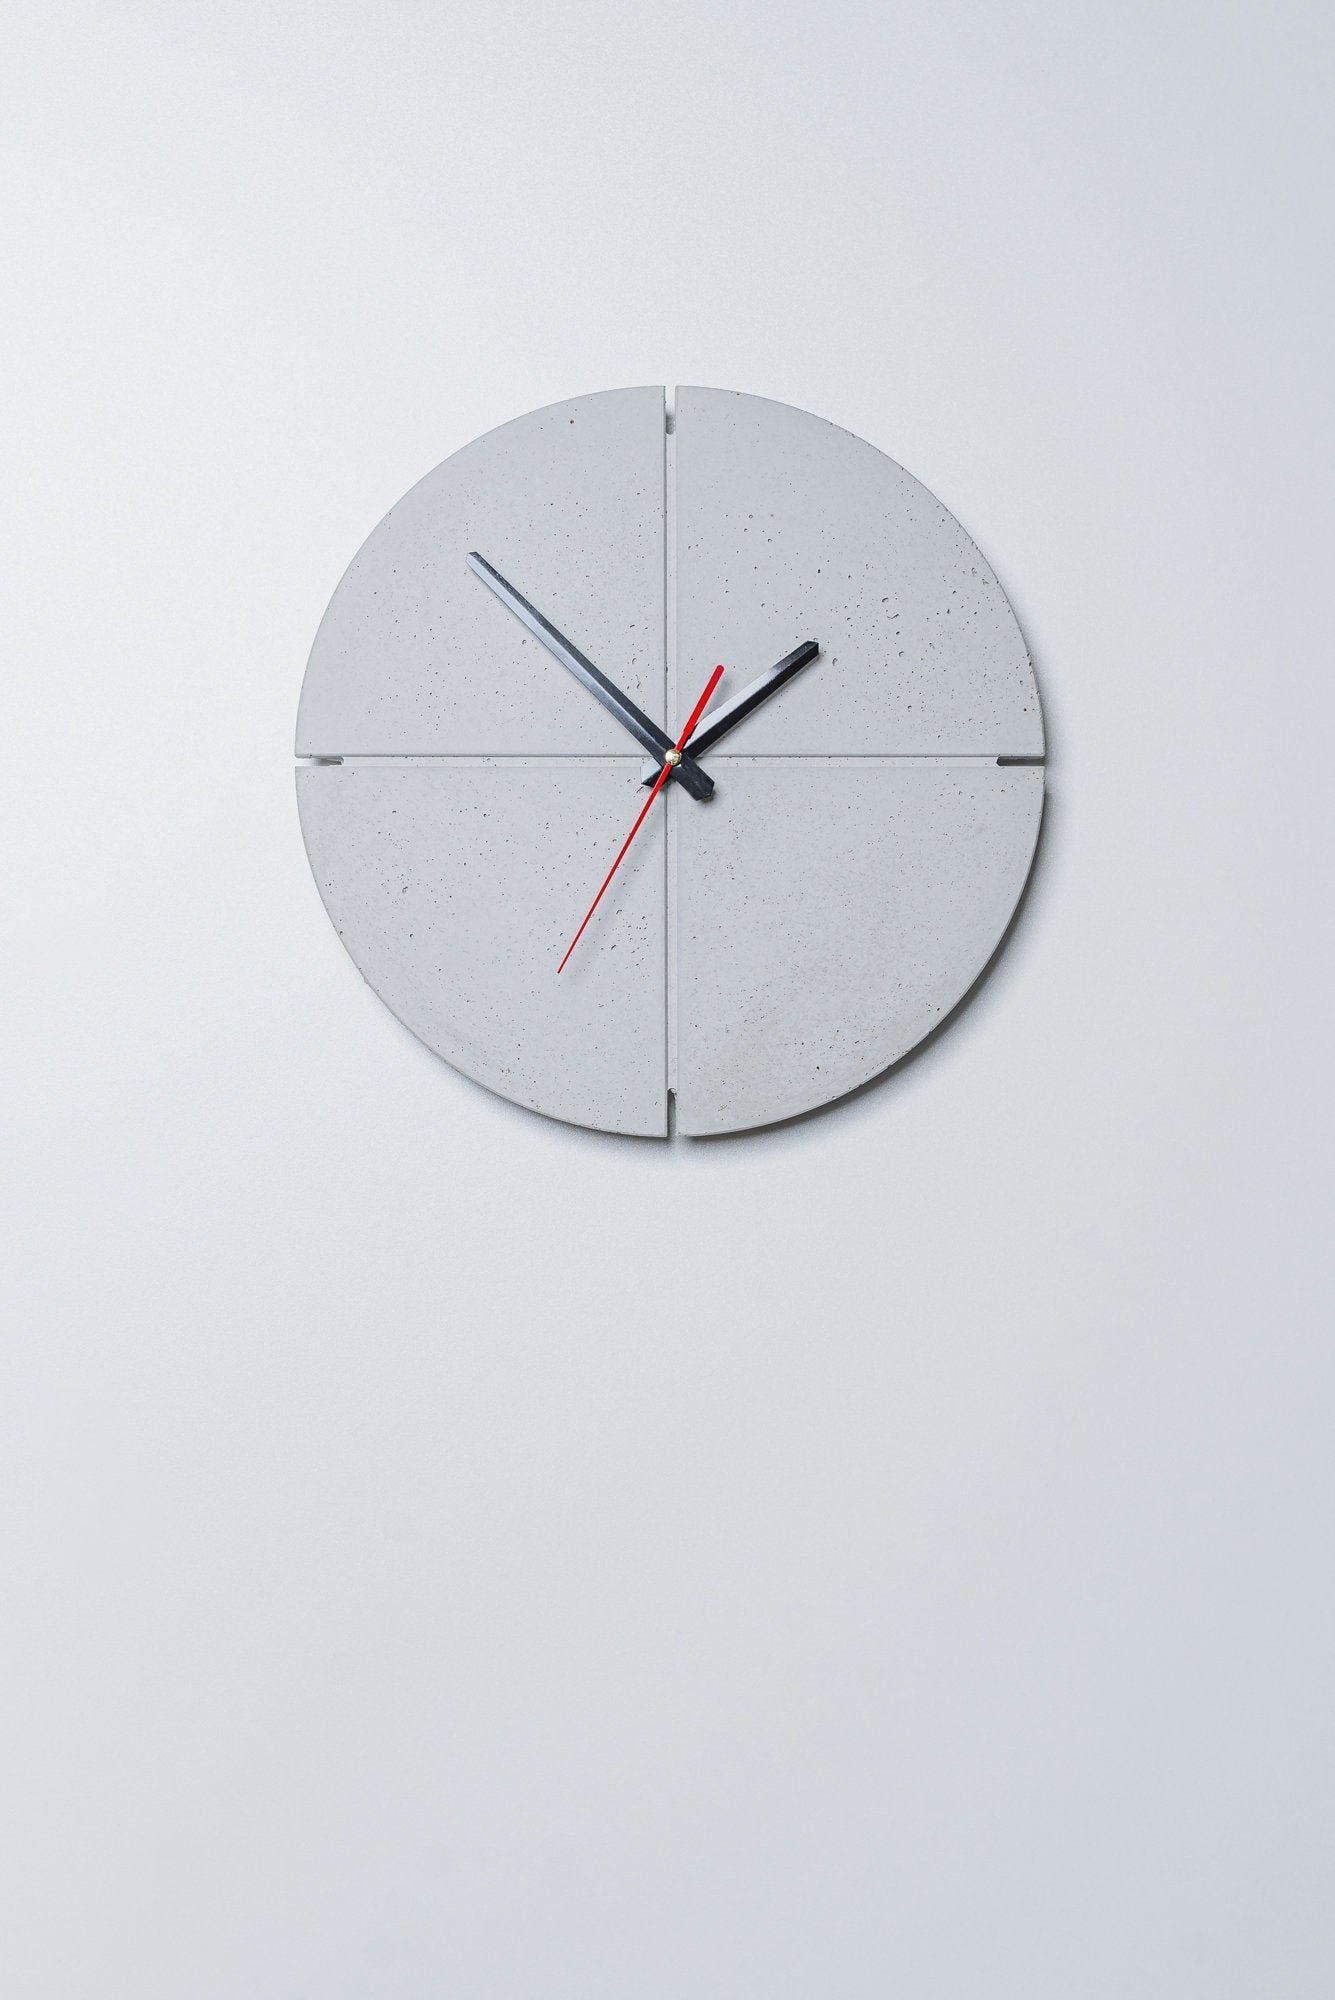 Modern Concrete Wall Clock Concrete Home Decor Industrial Etsy In 2020 Industrial Clock Wall Concrete Wall Wall Clock